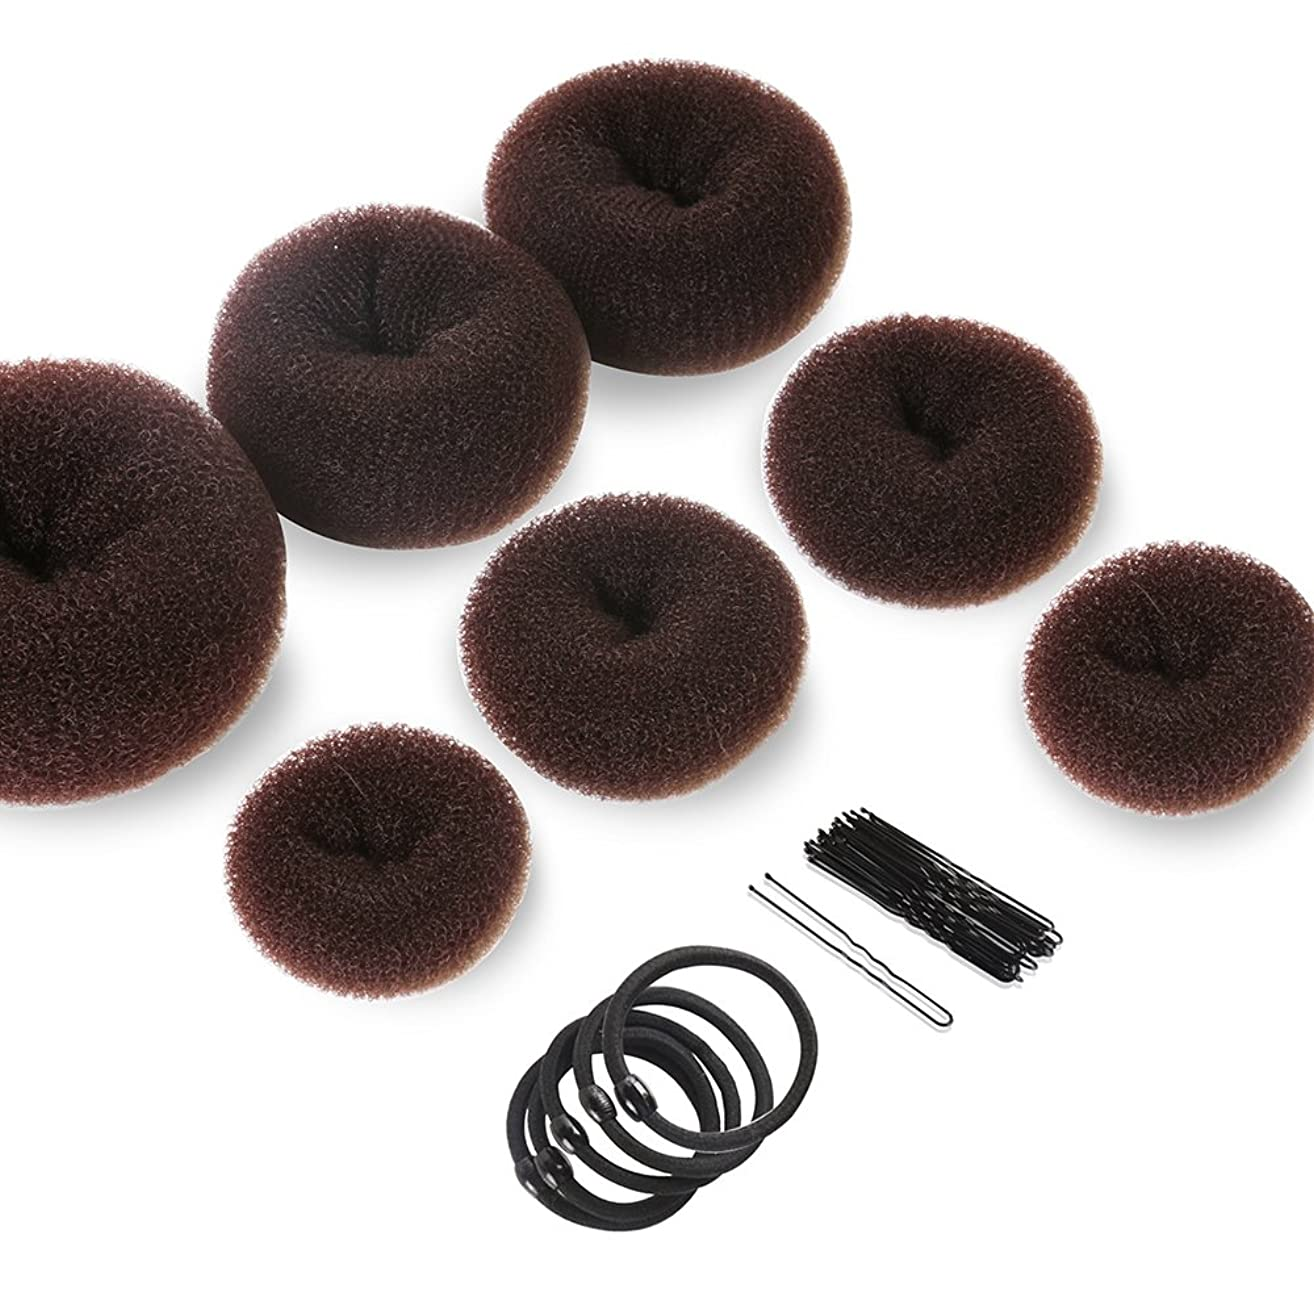 Donut Hair Bun Maker 7 Pieces, Teenitor Ring Style Bun Maker Set with Hair Bun Makers (1 extra-large, 2 large, 2 medium and 2 small), 5 pieces Hair Elastic Bands, 20 pieces Hair Pins, Dark Brown